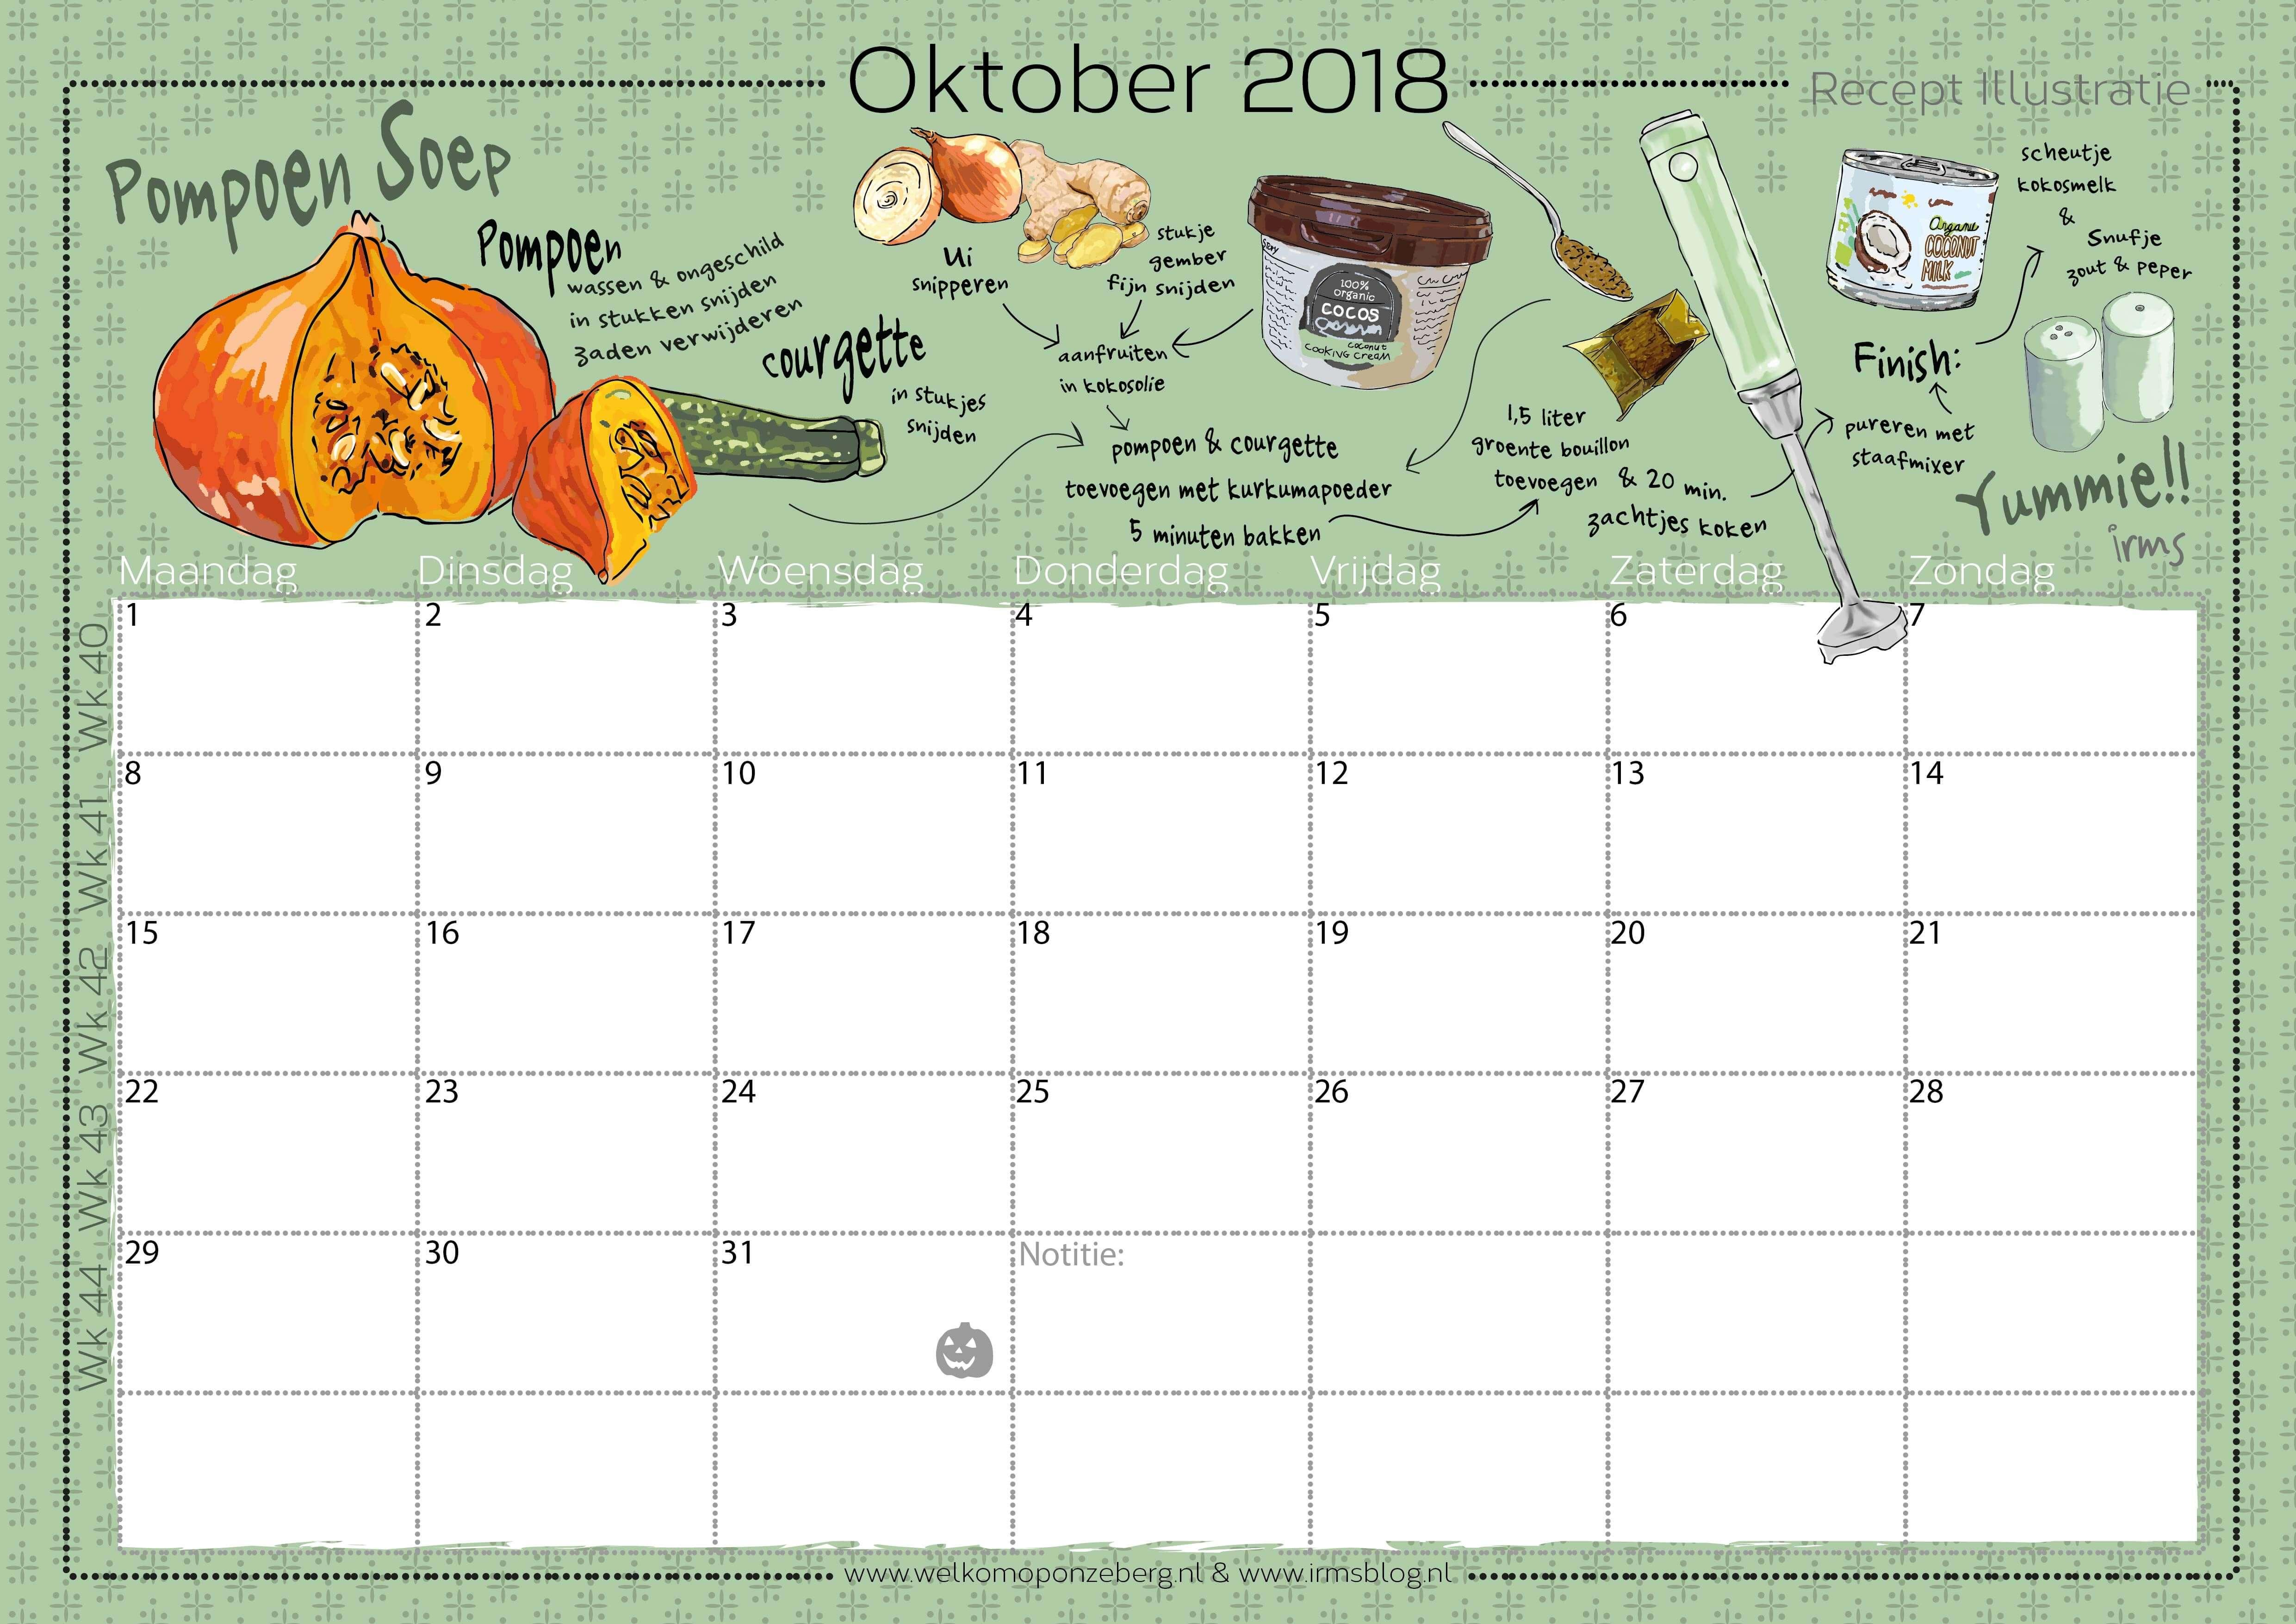 receptenkalender-2018-irmsblog_pompoensoep